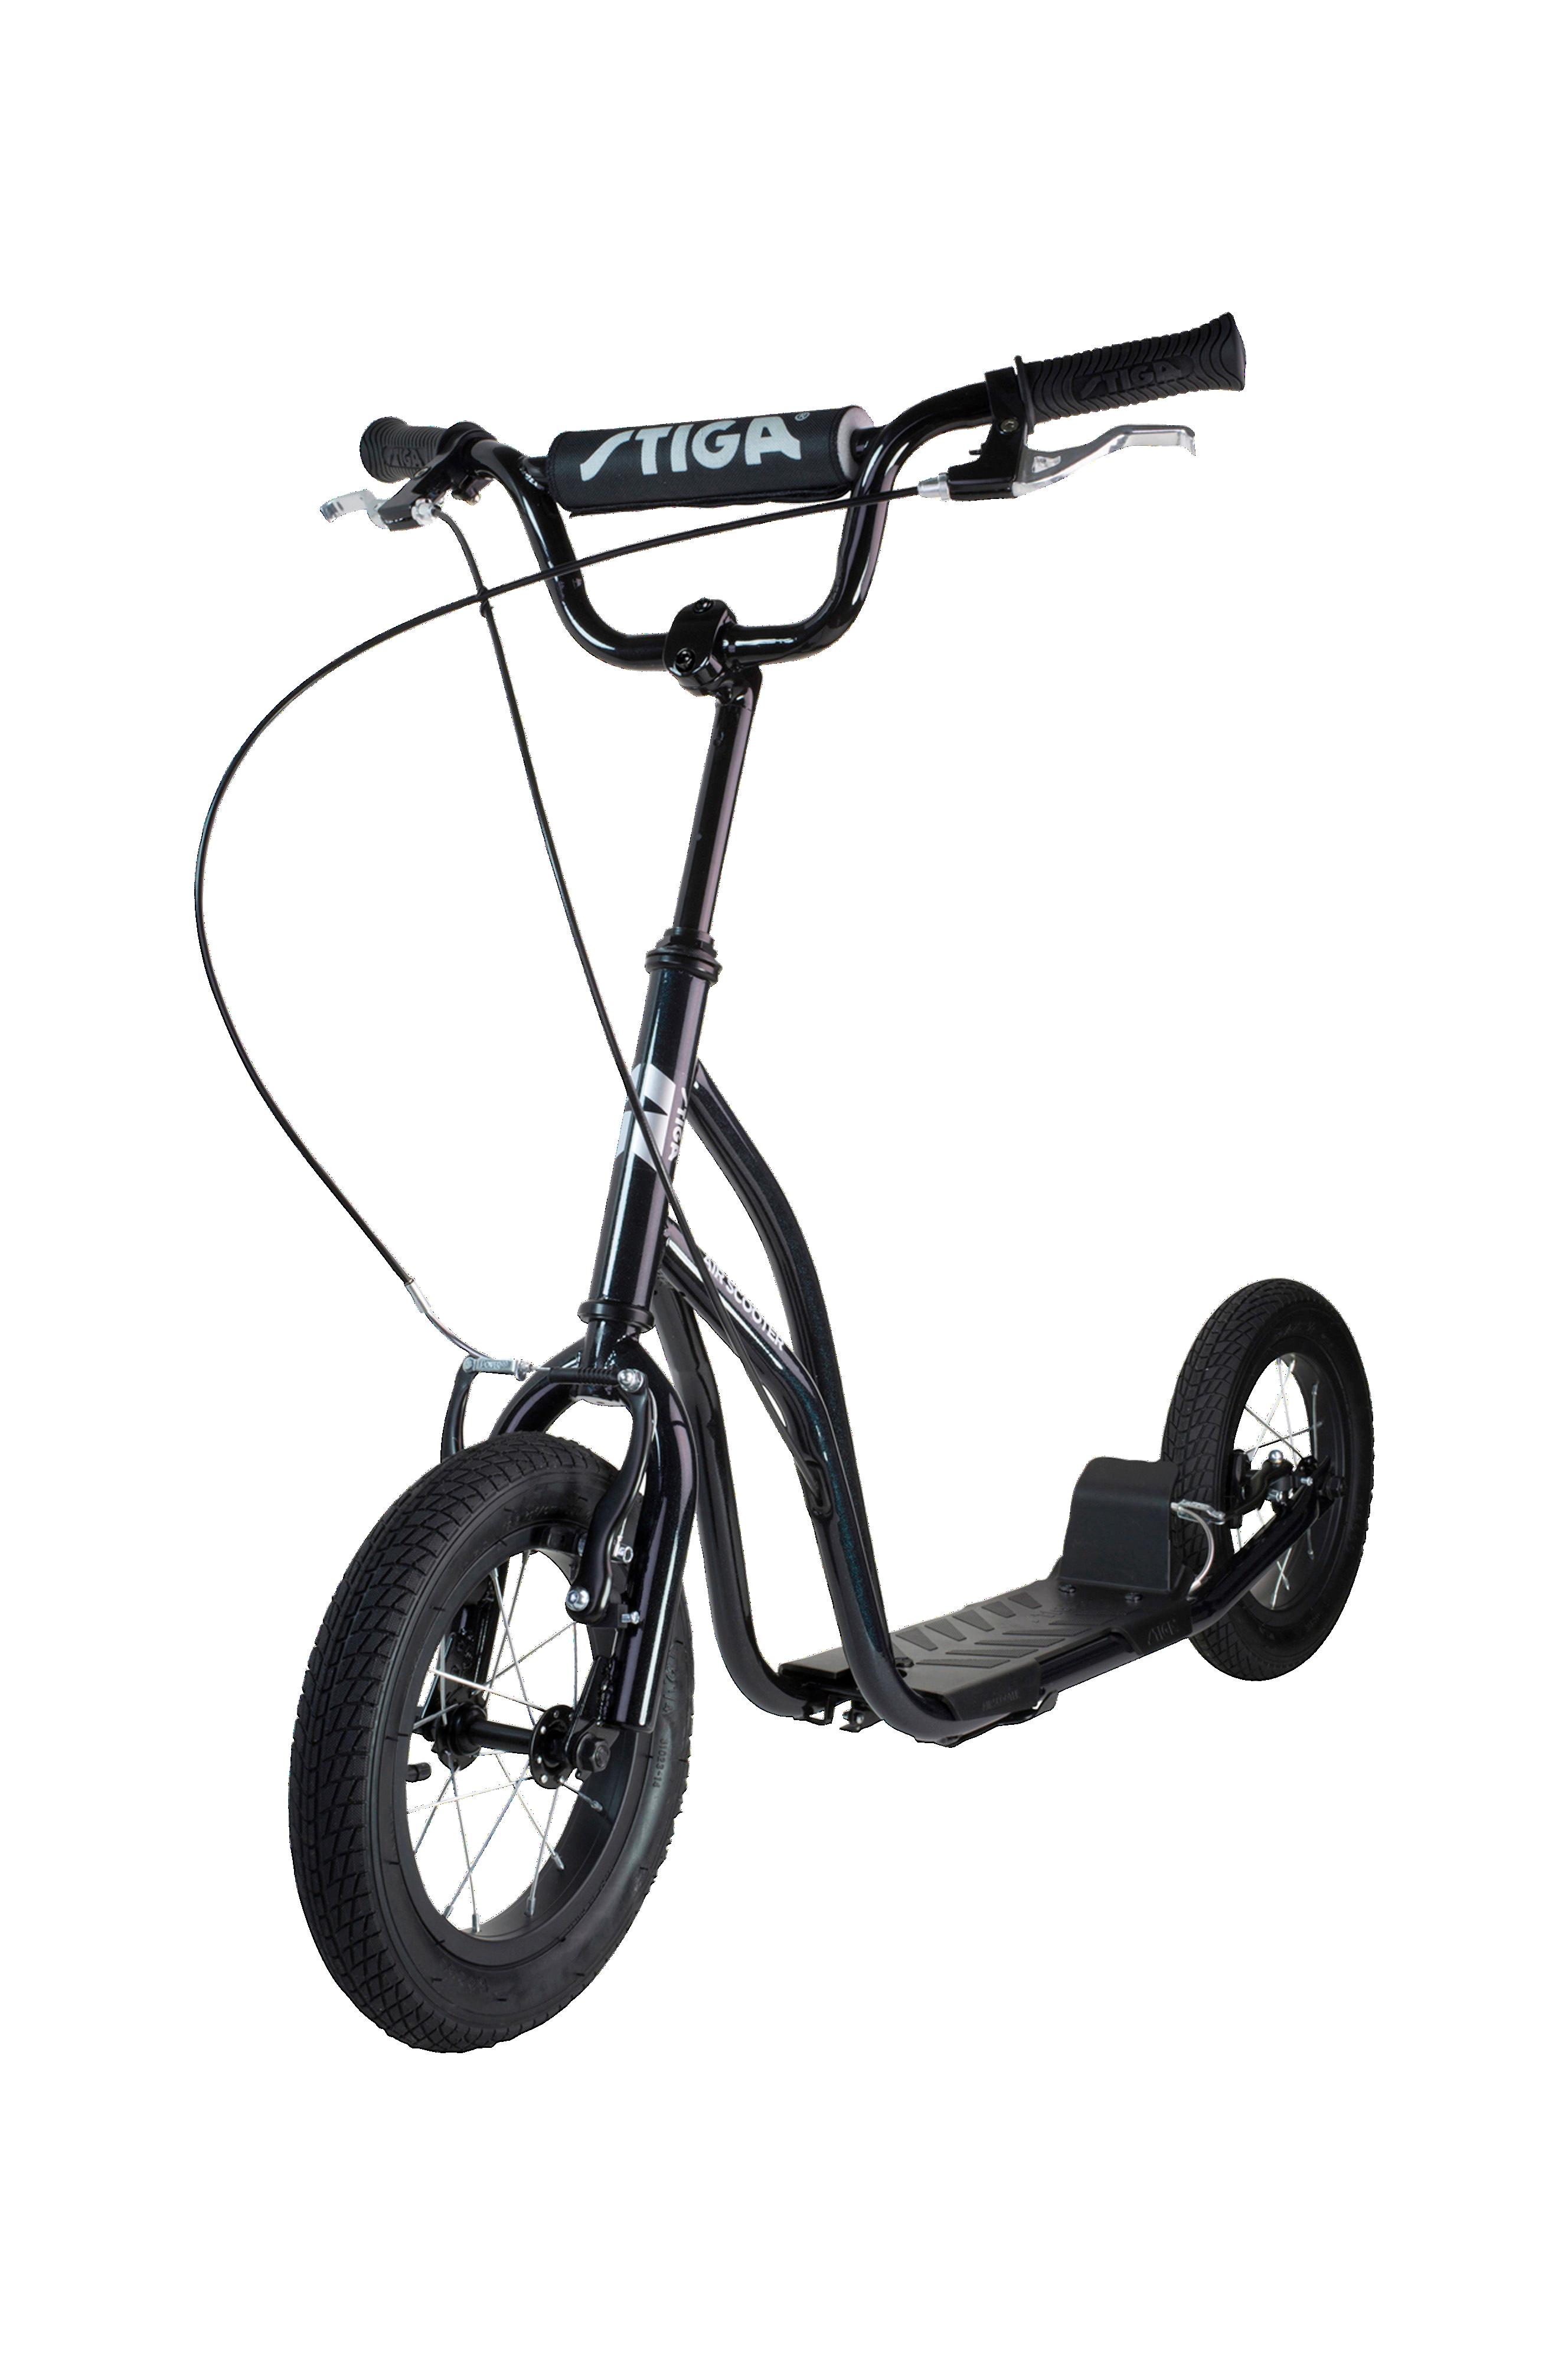 Stiga STR Air Scooter 12